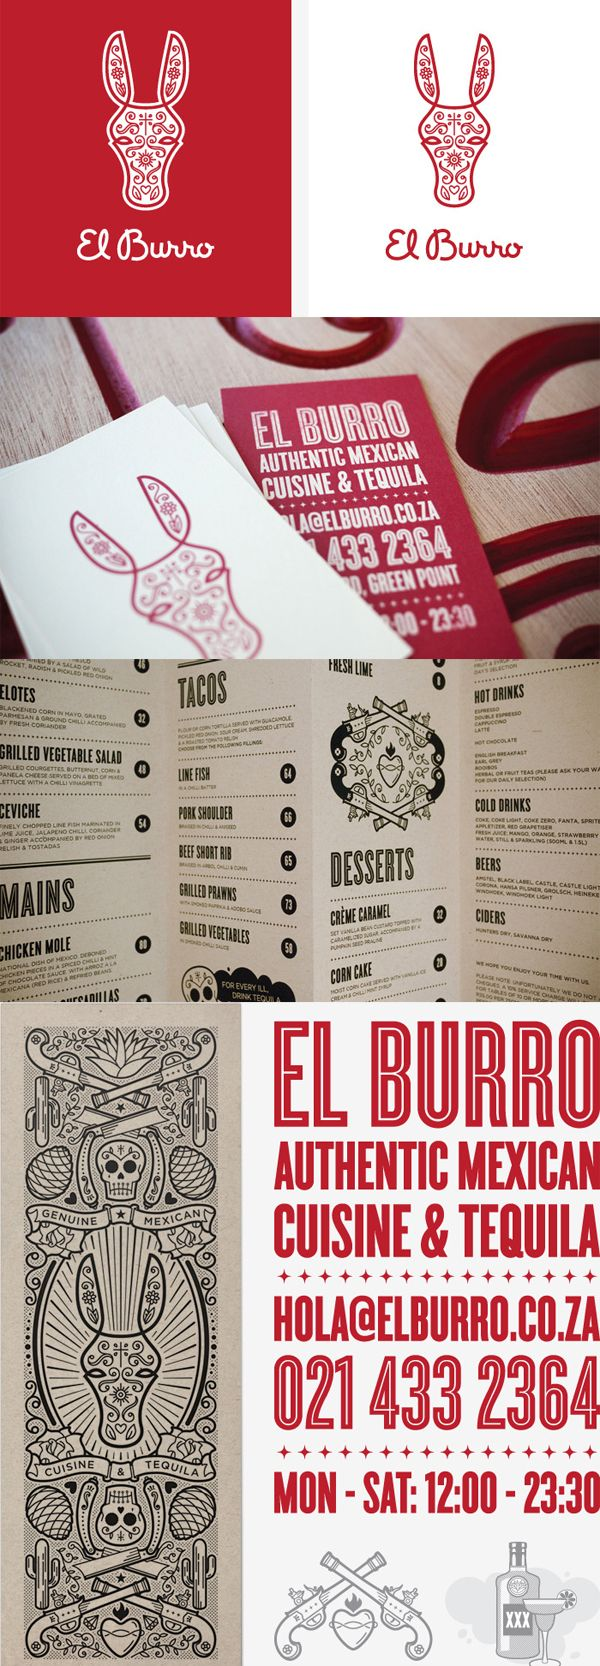 El Burro | Designer: Monday Design - http://www.mondaydesign.co.za #branding #design #identity